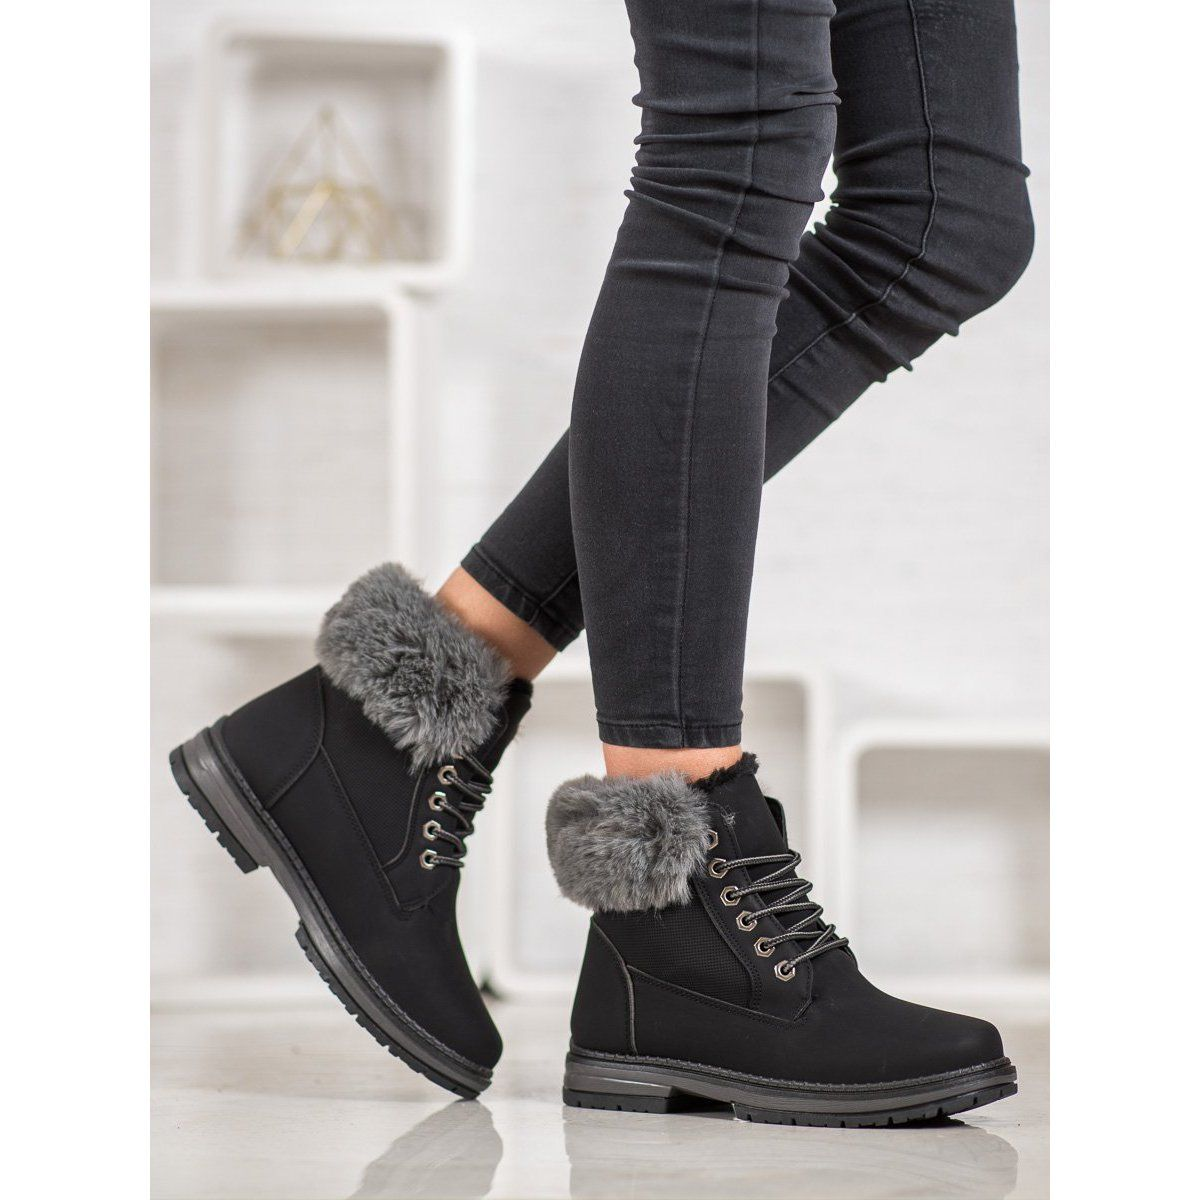 Botki Damskie Shelovet Shelovet Czarne Trapery Z Futerkiem Wedge Sneaker Shoes Fashion